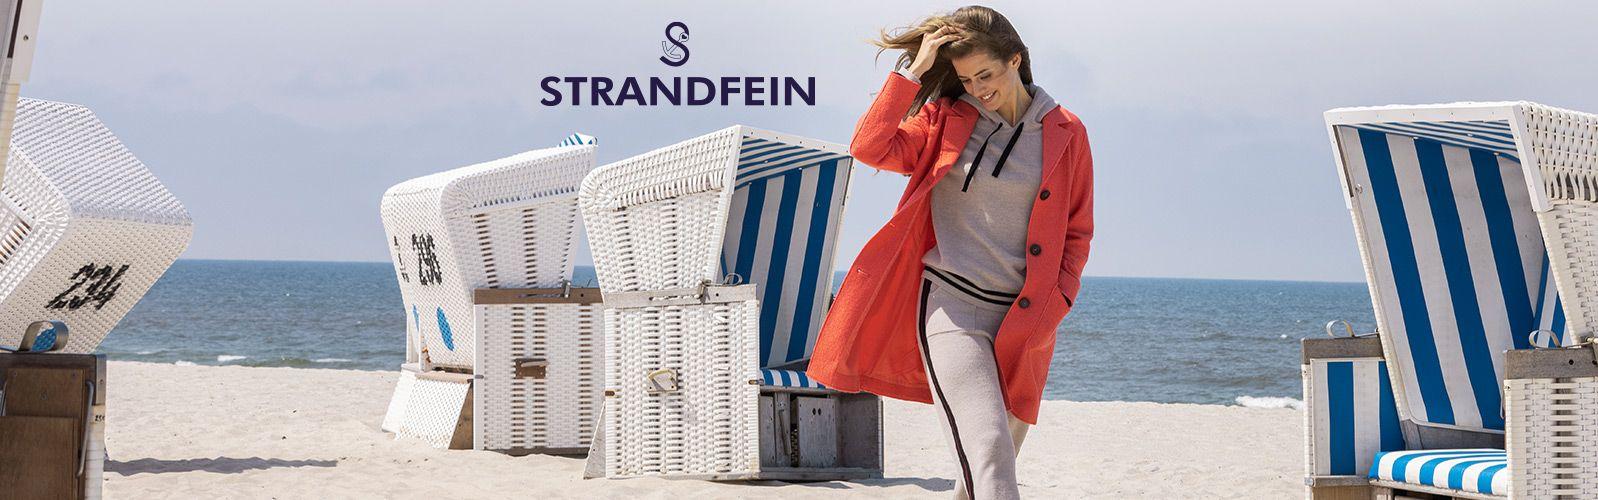 STRANDFEIN Designermode